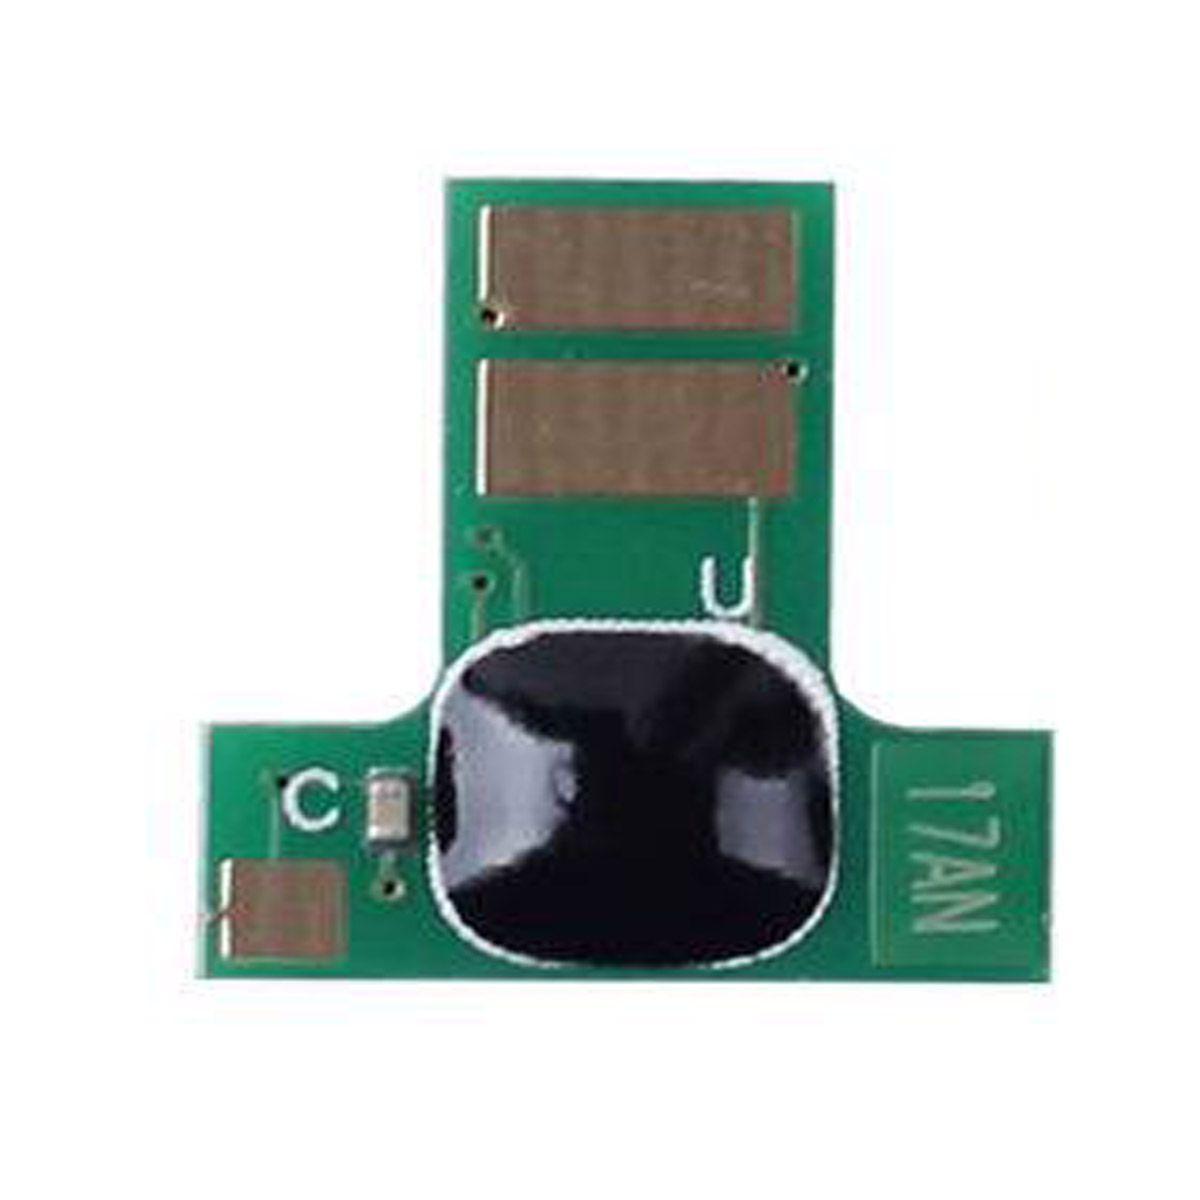 Chip HP CF217A 217A 17a - M130 M102 M130FW M130FN M102A M102W